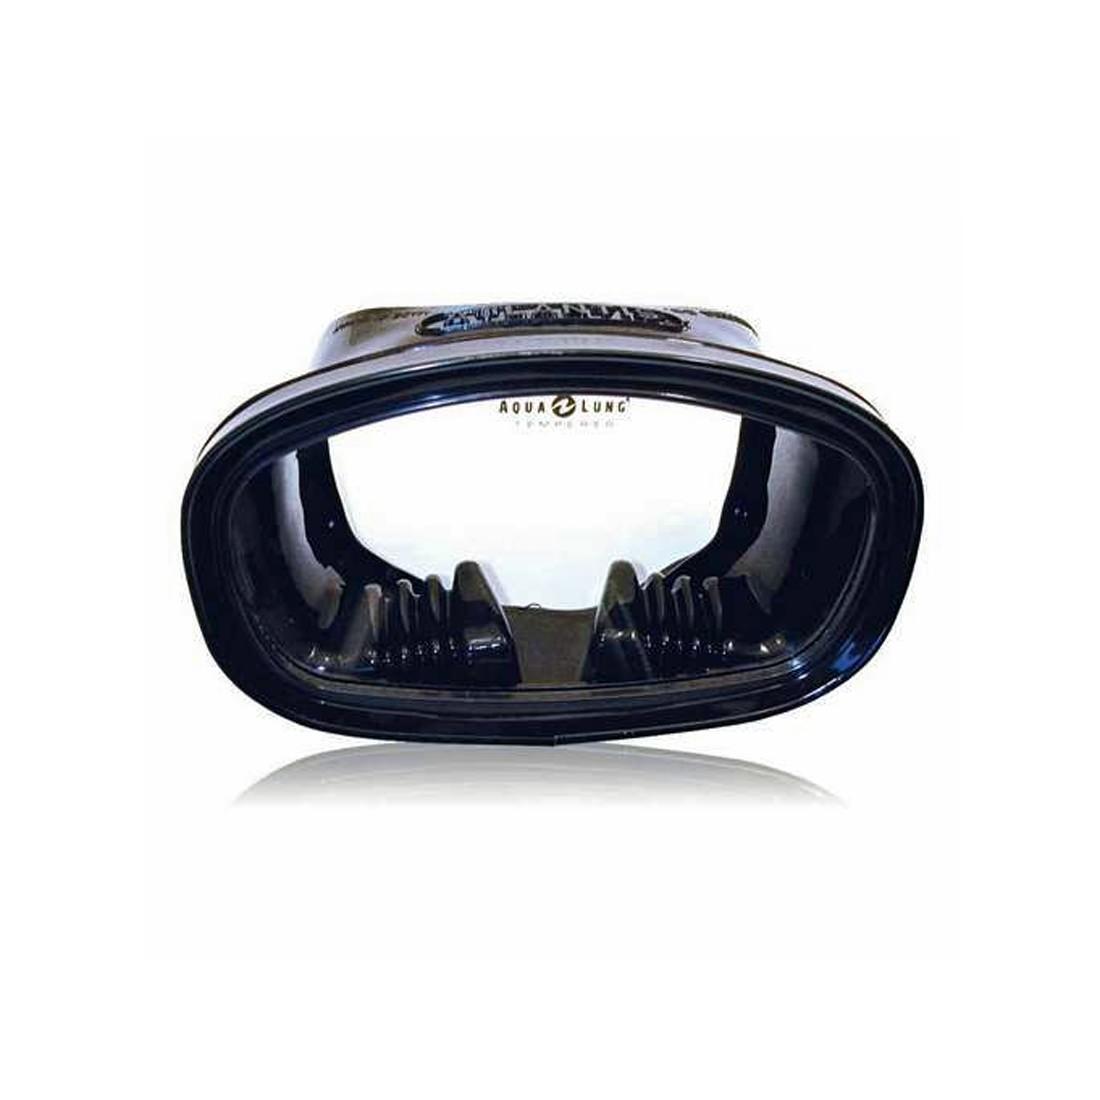 Aqua Lung Atlantis Mask 5077-10